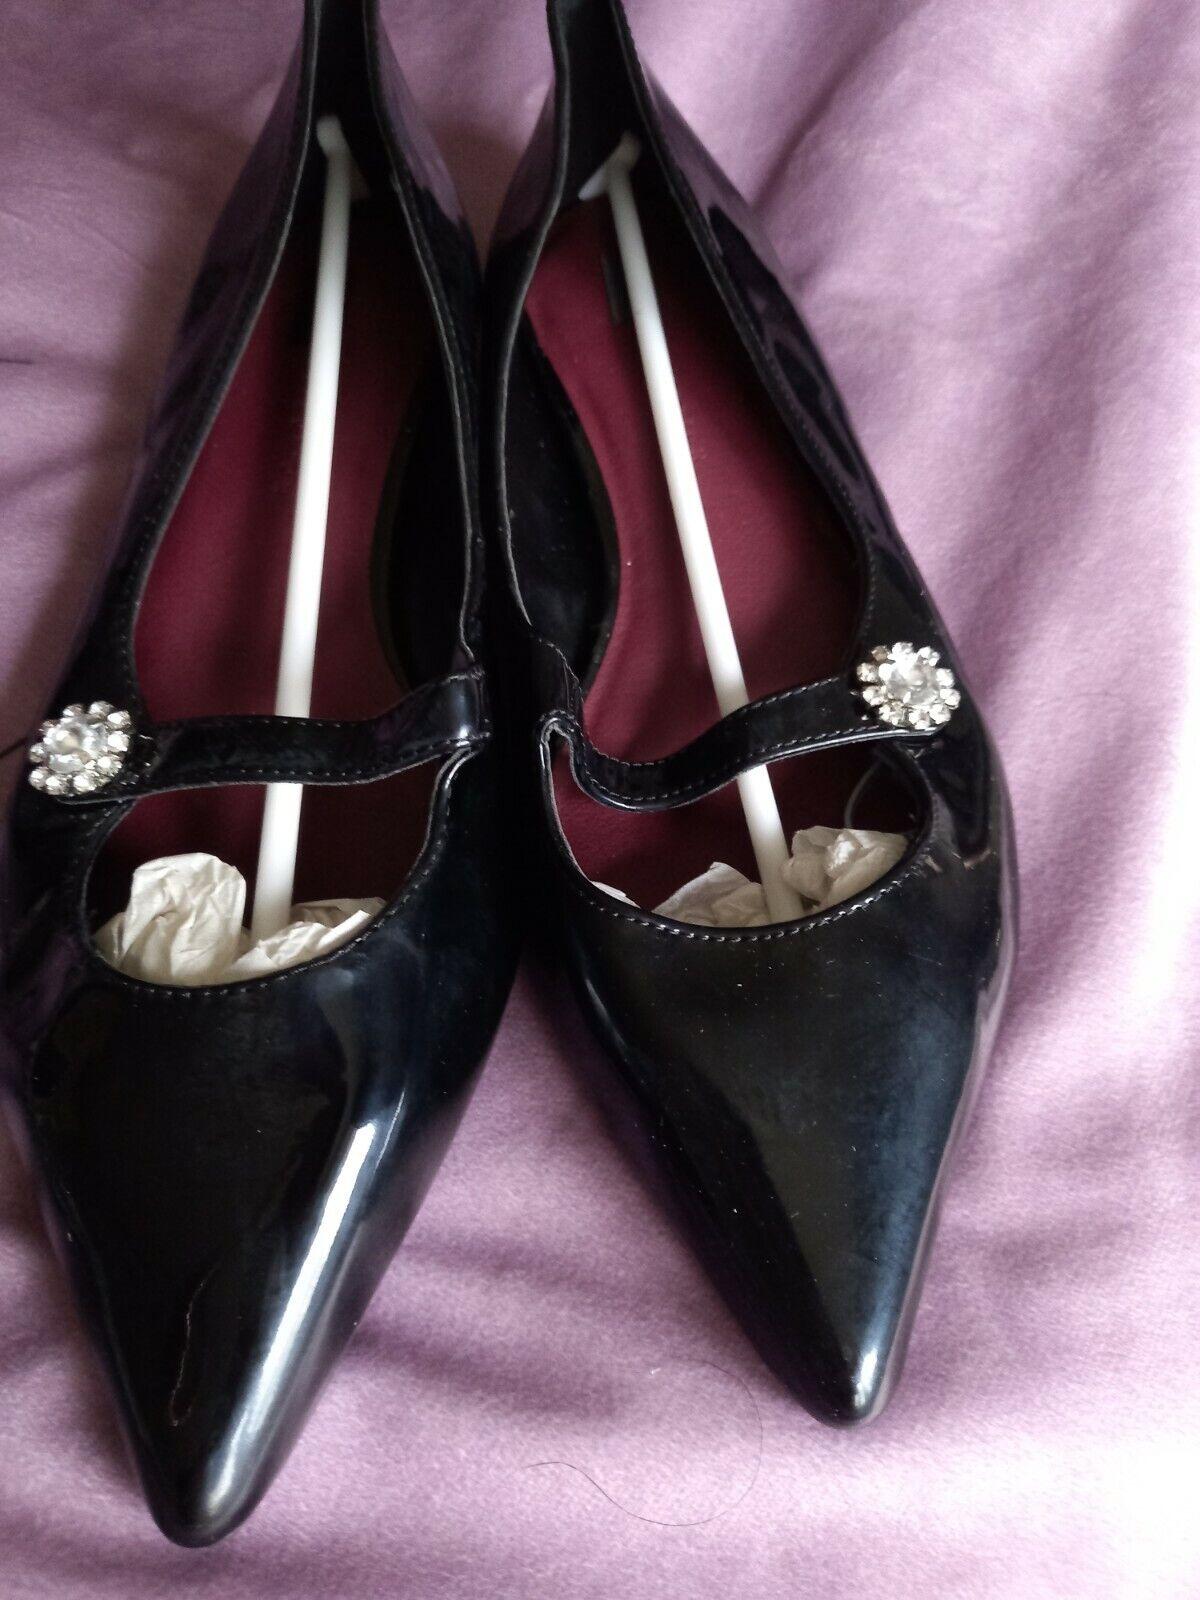 Marks And Spencer Black Slip On Shoes Uk 7 NEW